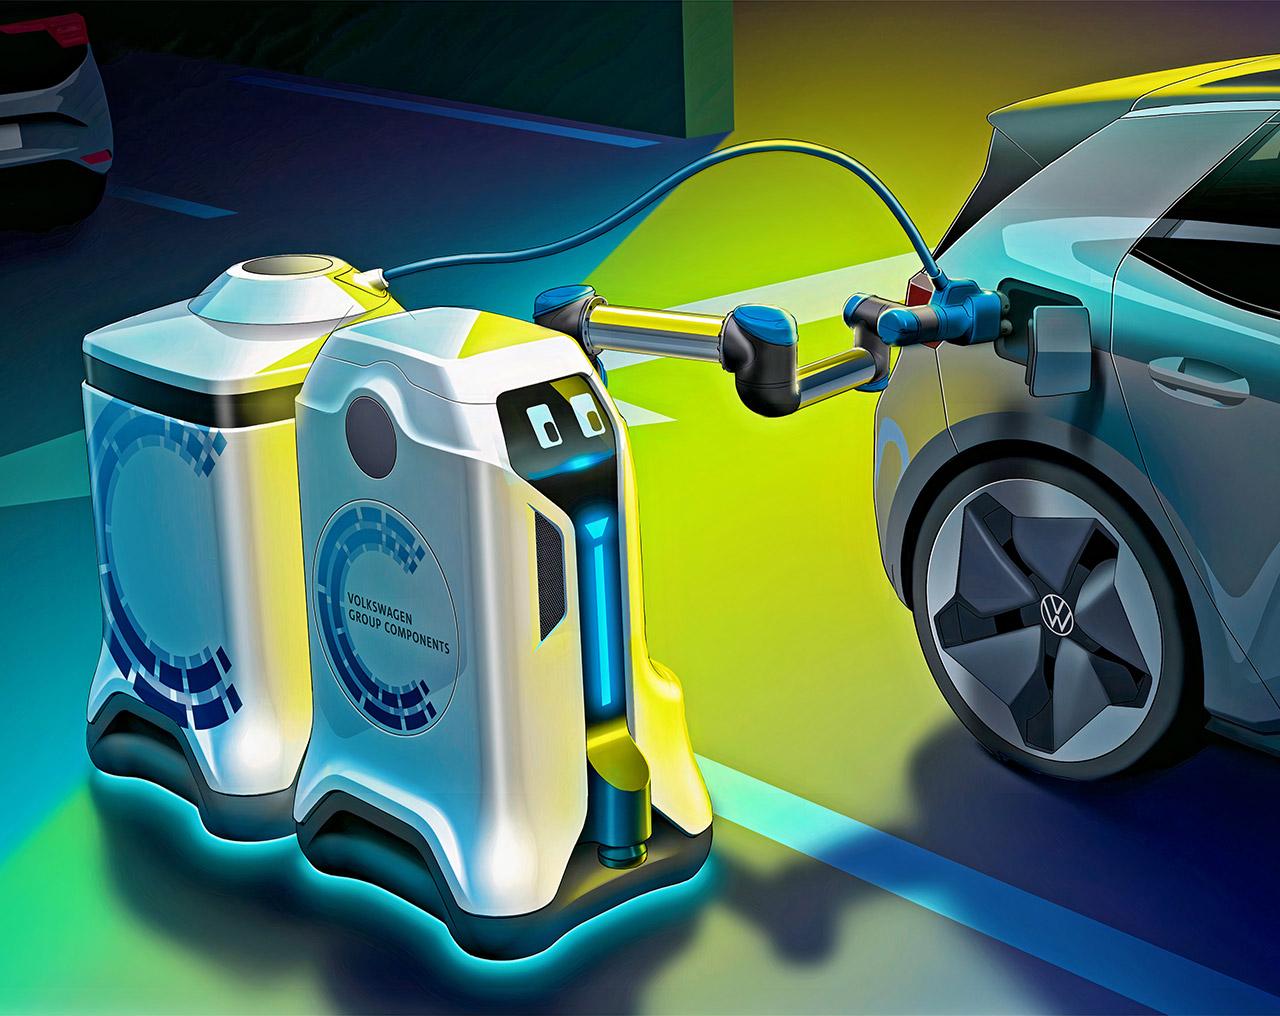 Volkswagen Mobile Charging Robot EV